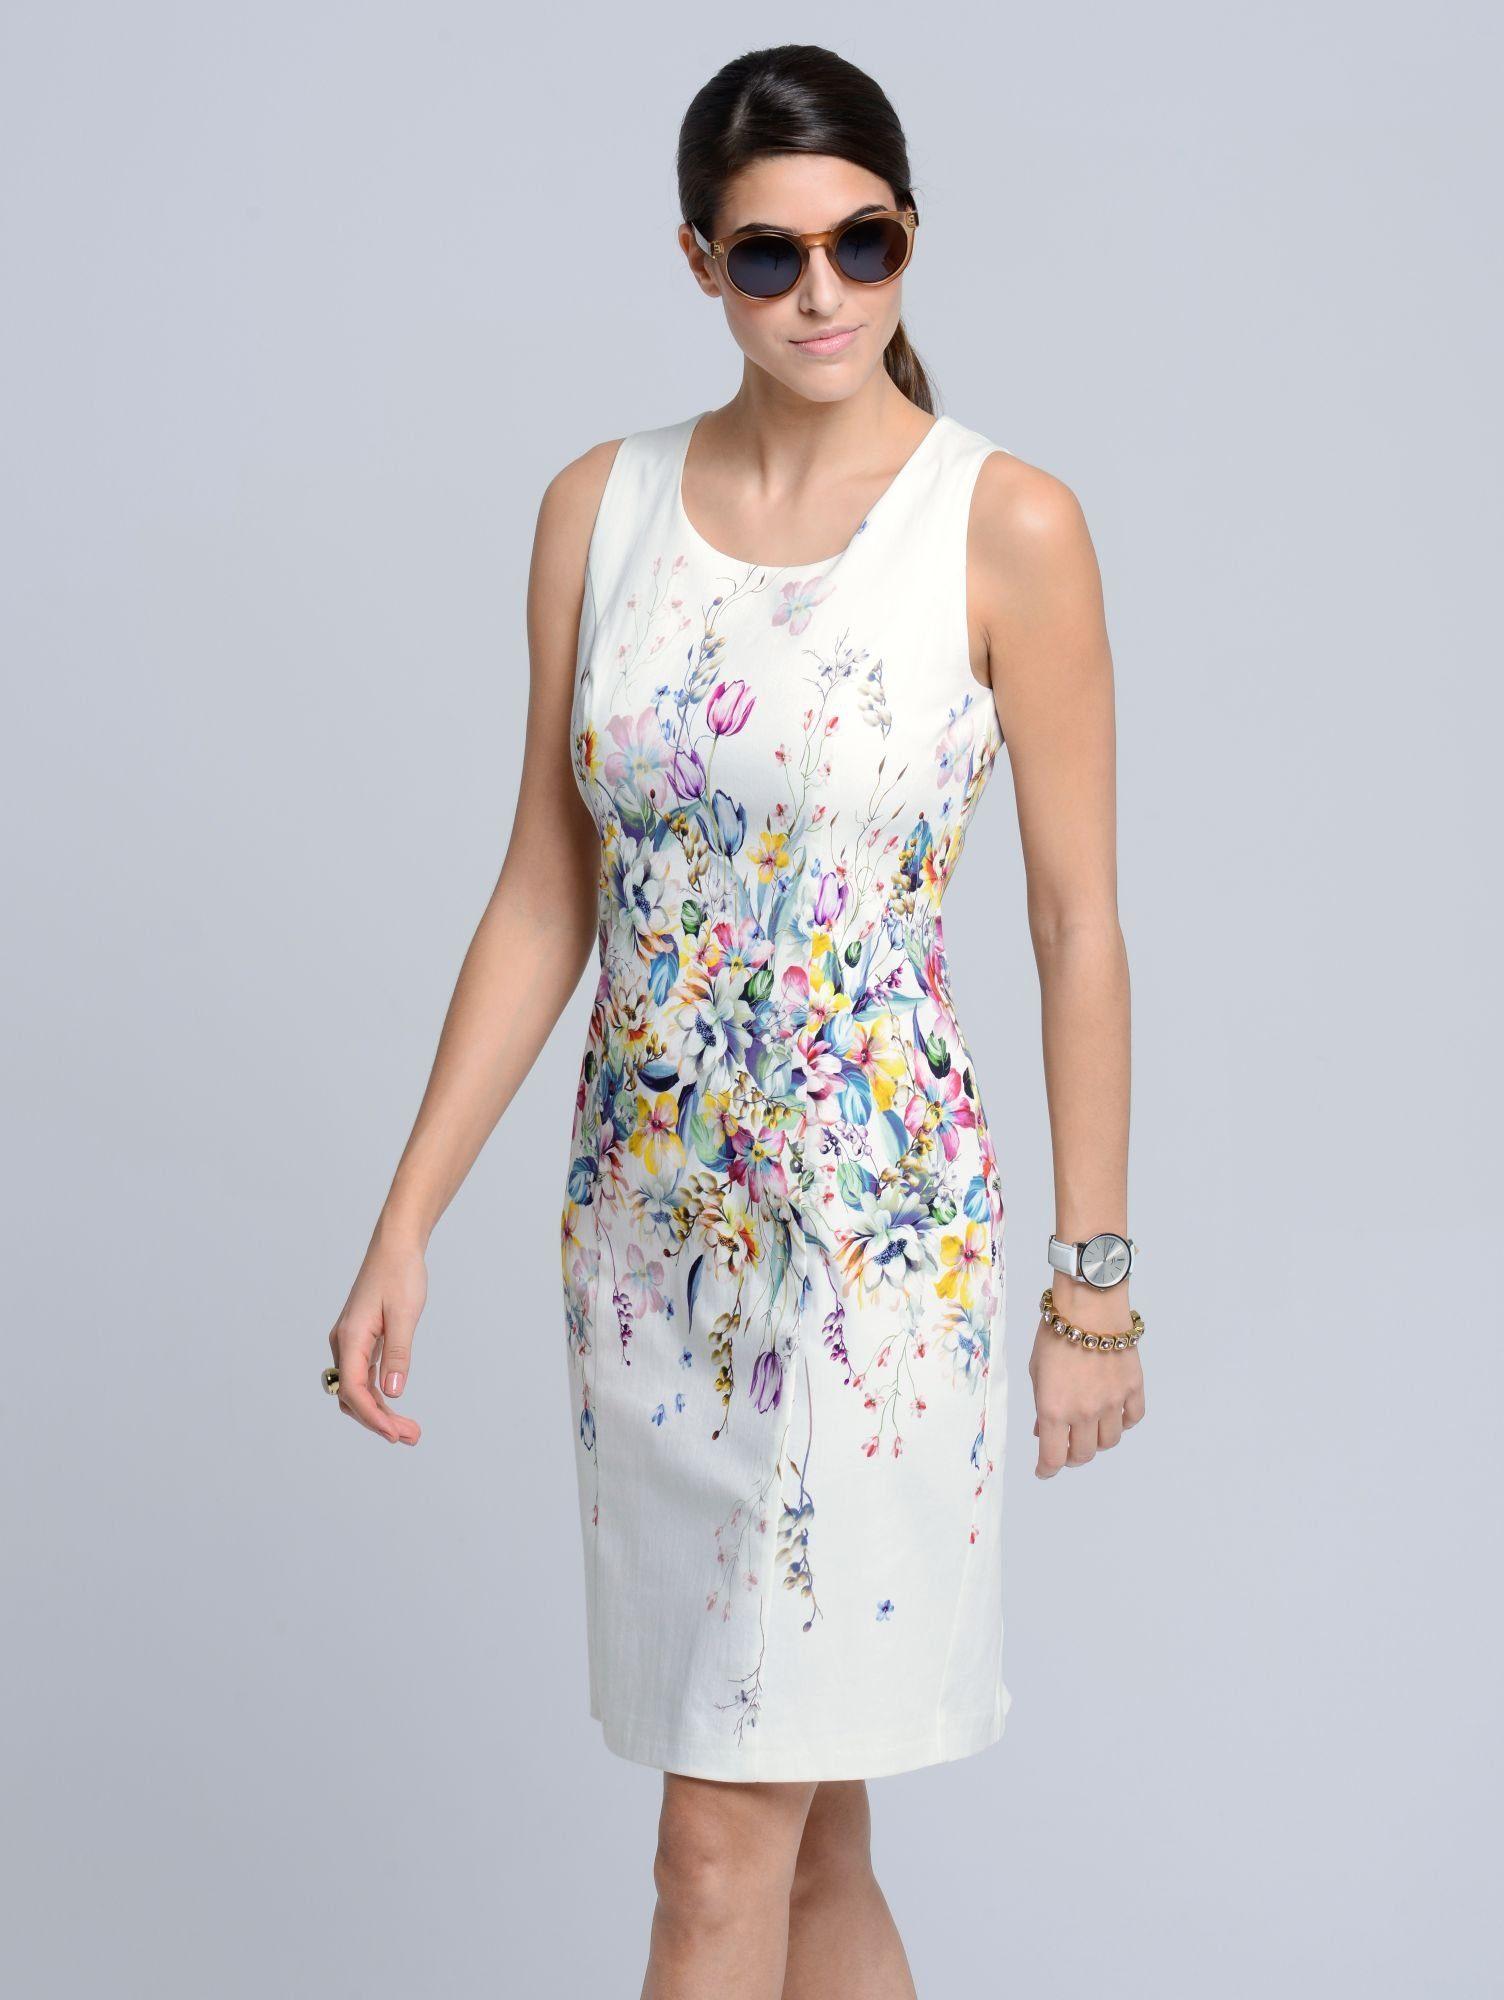 new product 09adb 69539 Alba Moda Etui-Kleid im exklusiven Alba Moda-Print online bestellen | BAUR